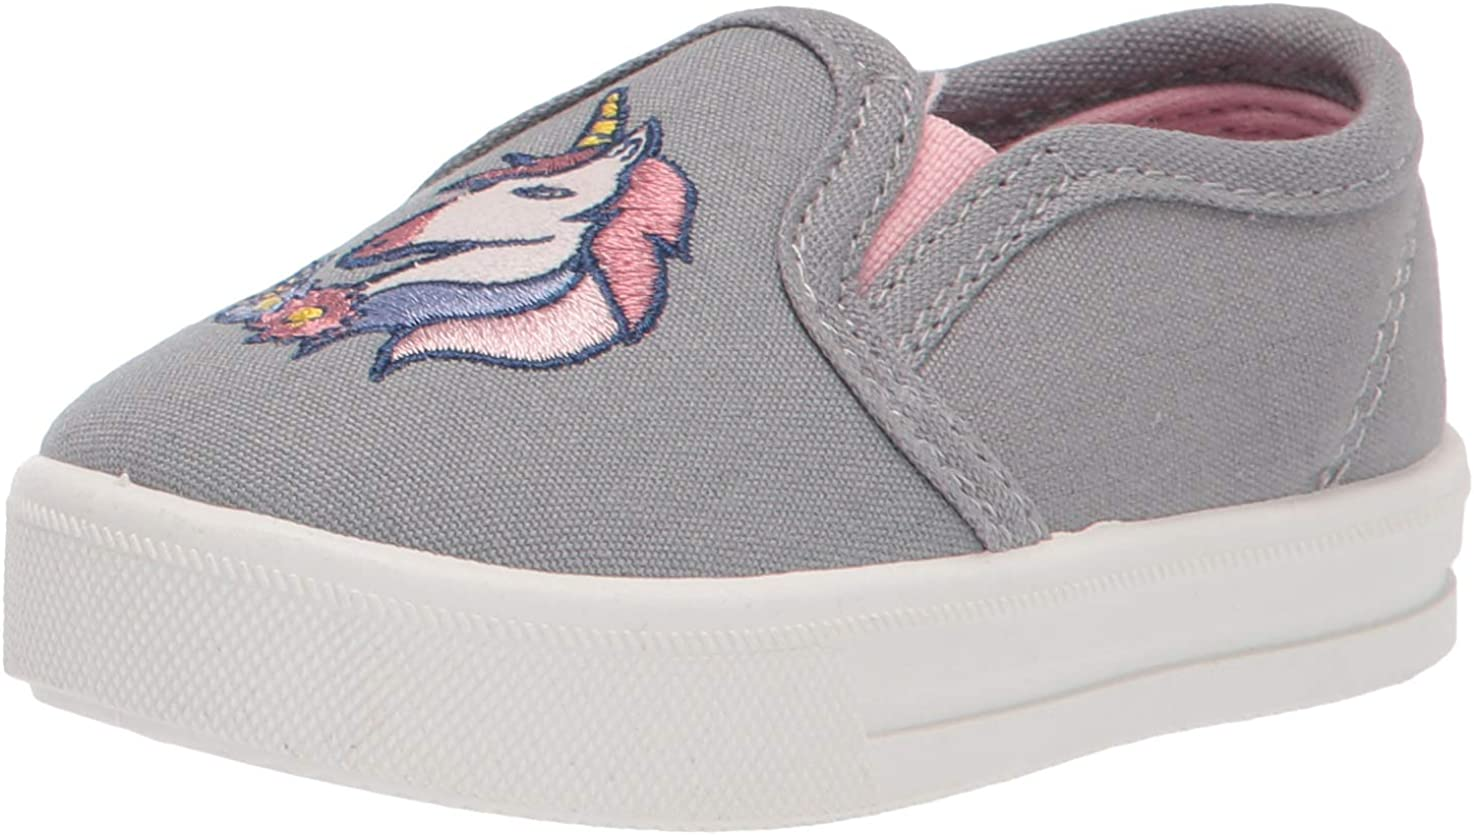 OshKosh B'Gosh Unisex-Child Maeve New color Oklahoma City Mall Sneaker Casual Slip-on